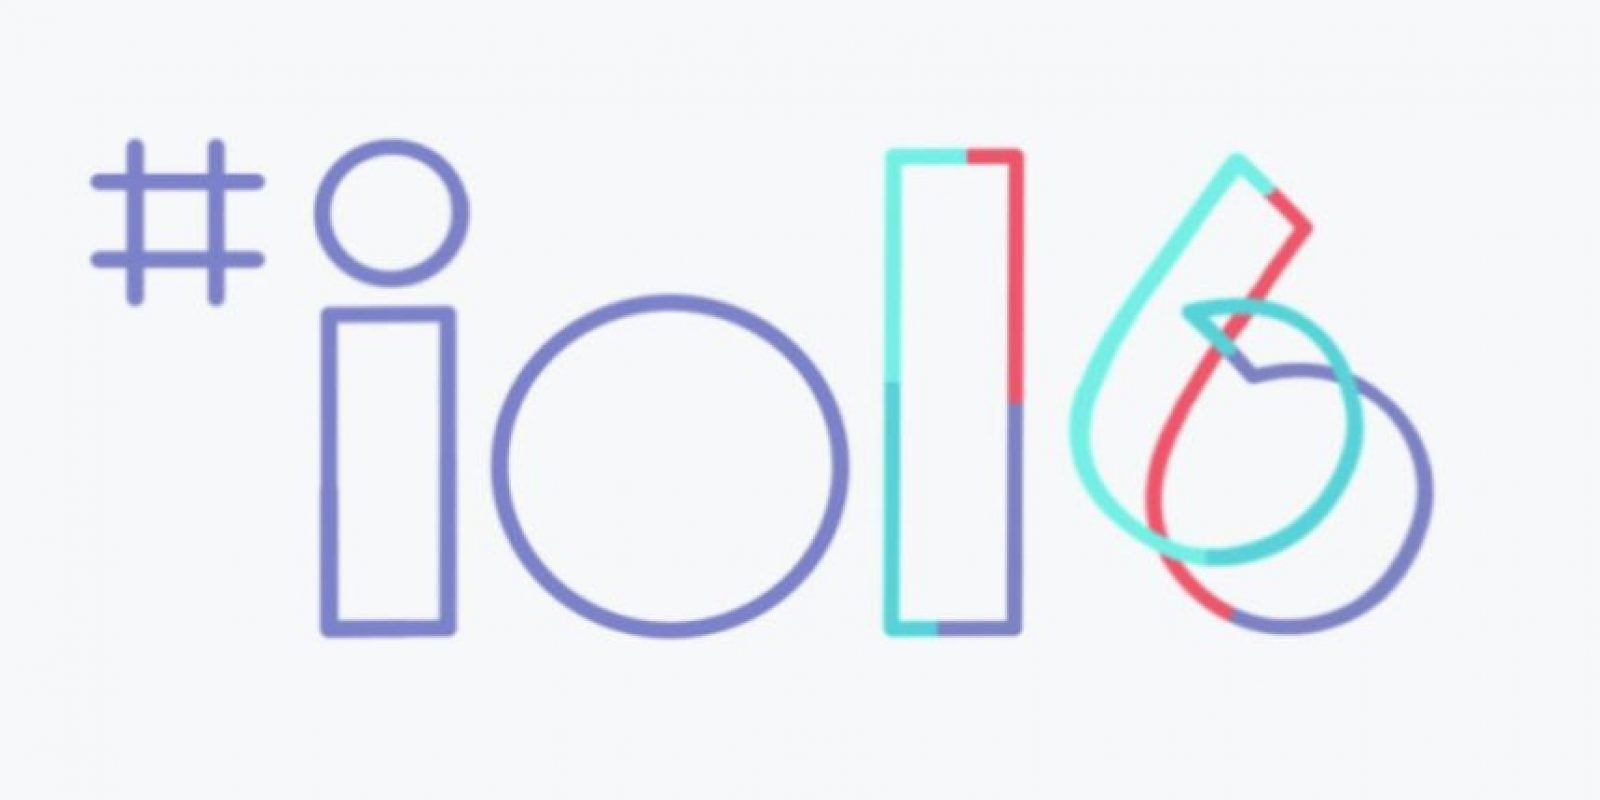 Es la conferencia anual de desarrolladores de Google. Foto:Google I/O